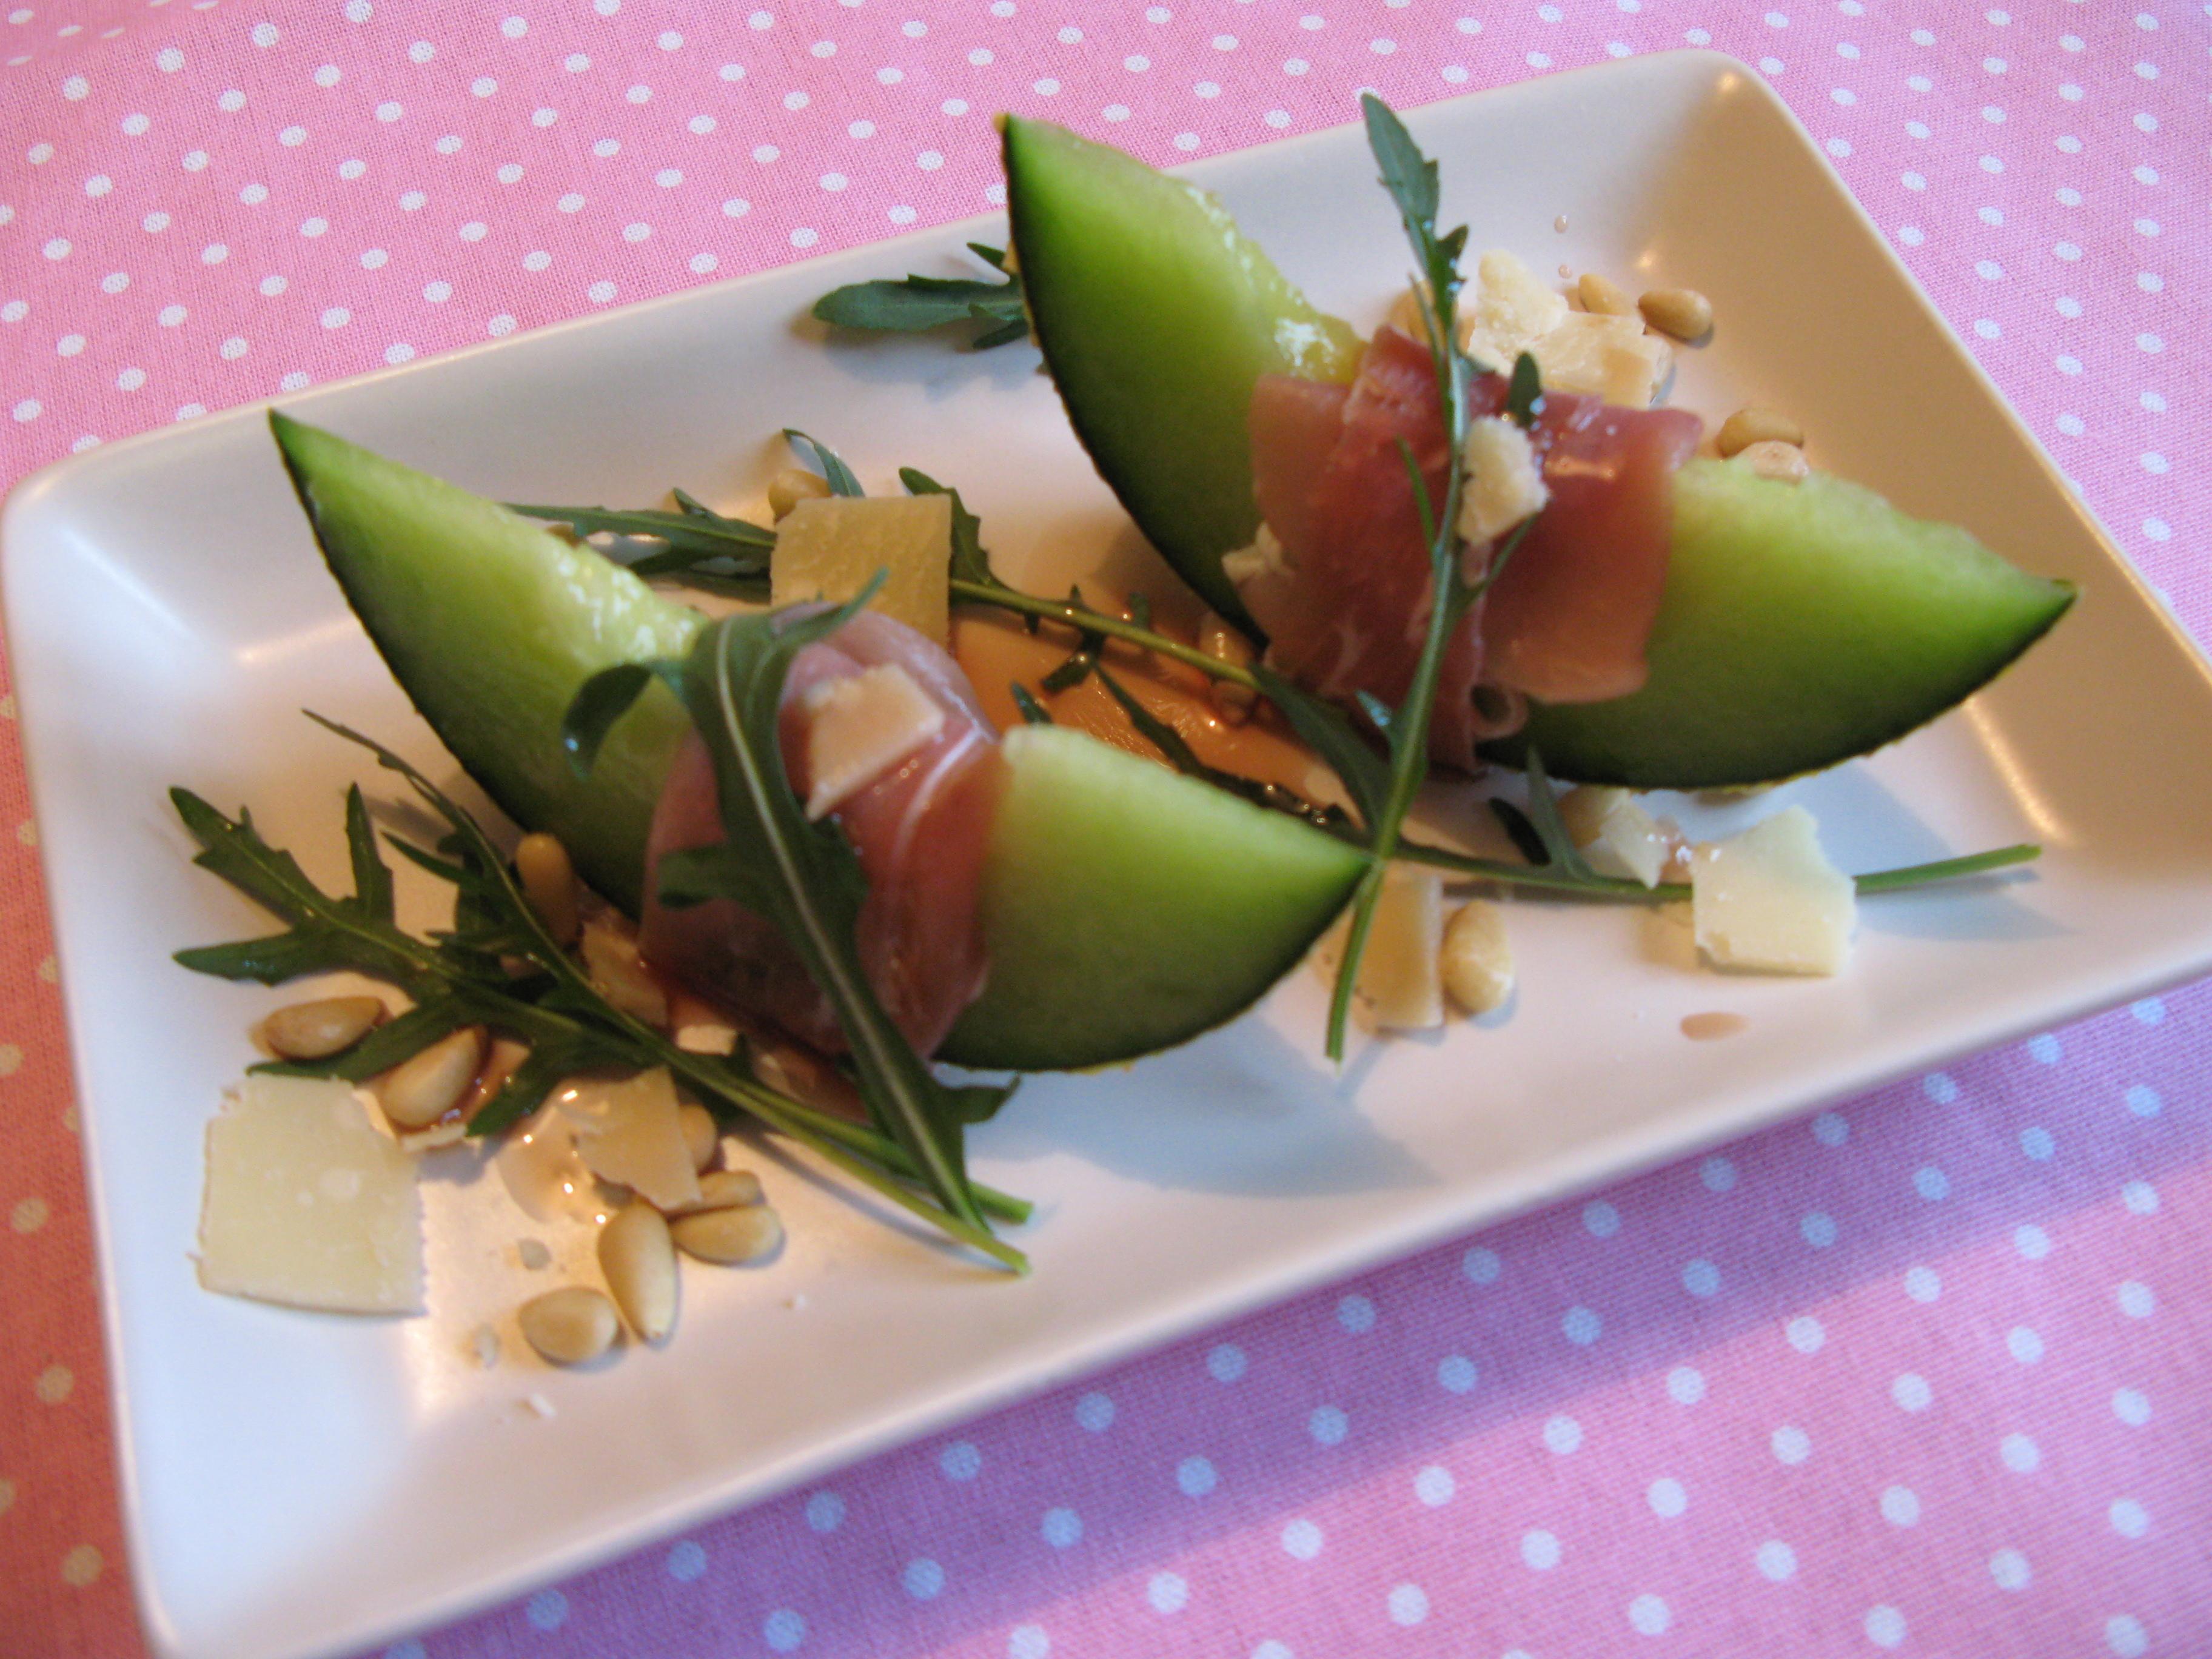 Melonbåtar med skinka